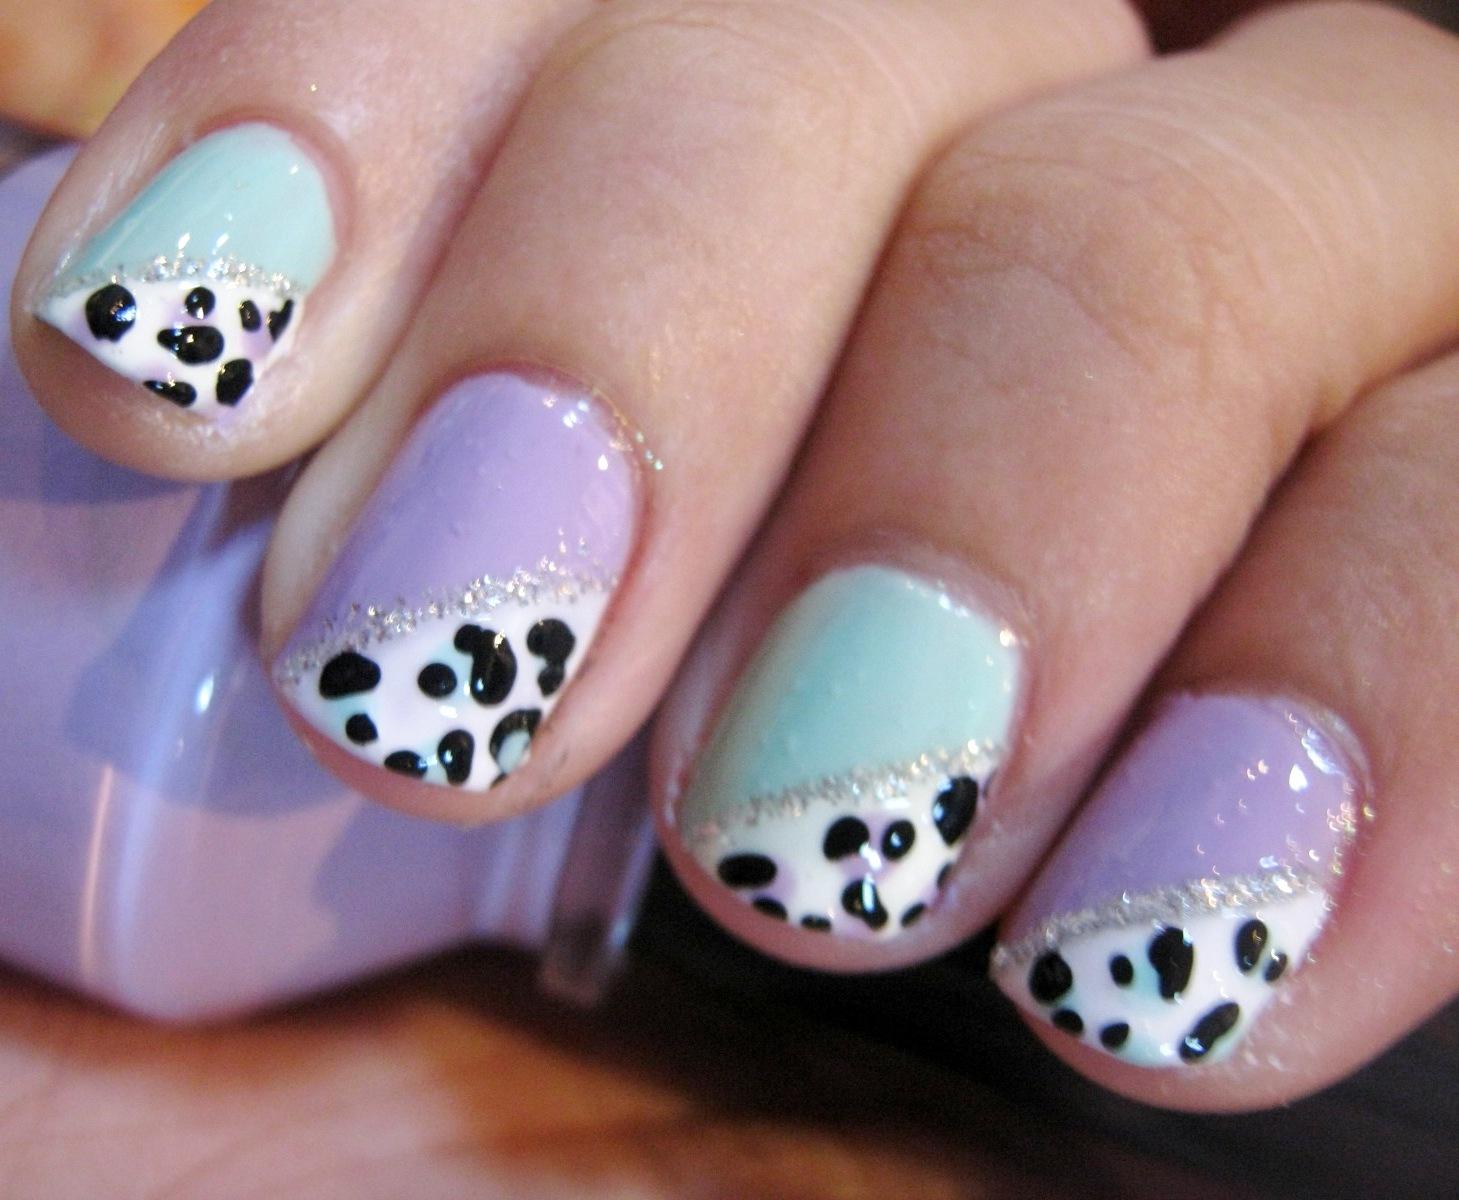 Nail tutorial simple pastel leopard design short nails - Easy nail designs for short nails at home ...